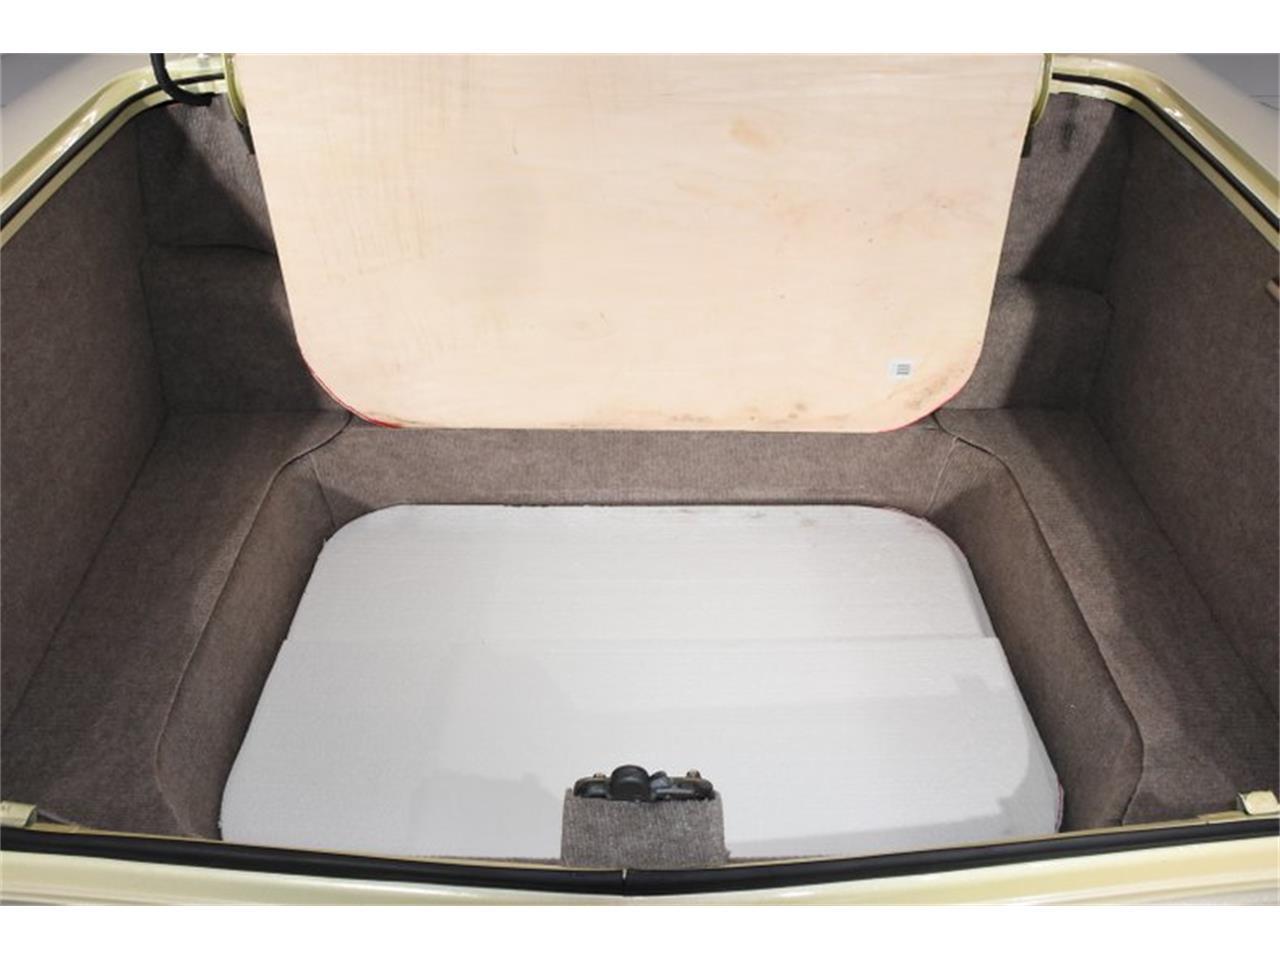 Large Picture of Classic 1962 Chevrolet Impala located in Volo Illinois - $51,998.00 - QIVA